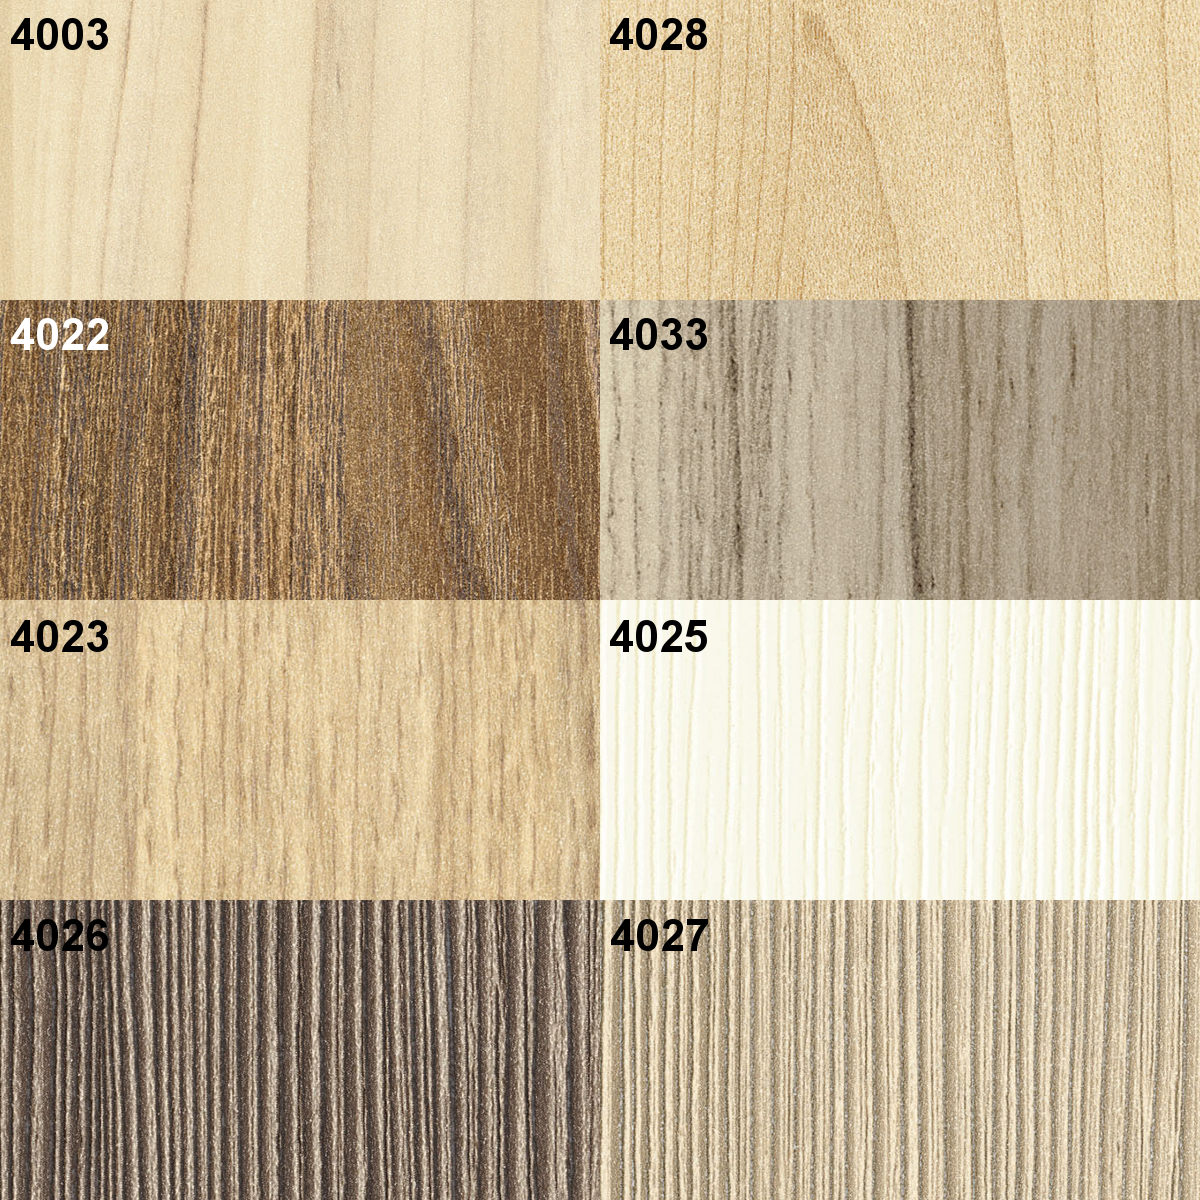 paneele f r wand und decke meister paneele bocado 250. Black Bedroom Furniture Sets. Home Design Ideas